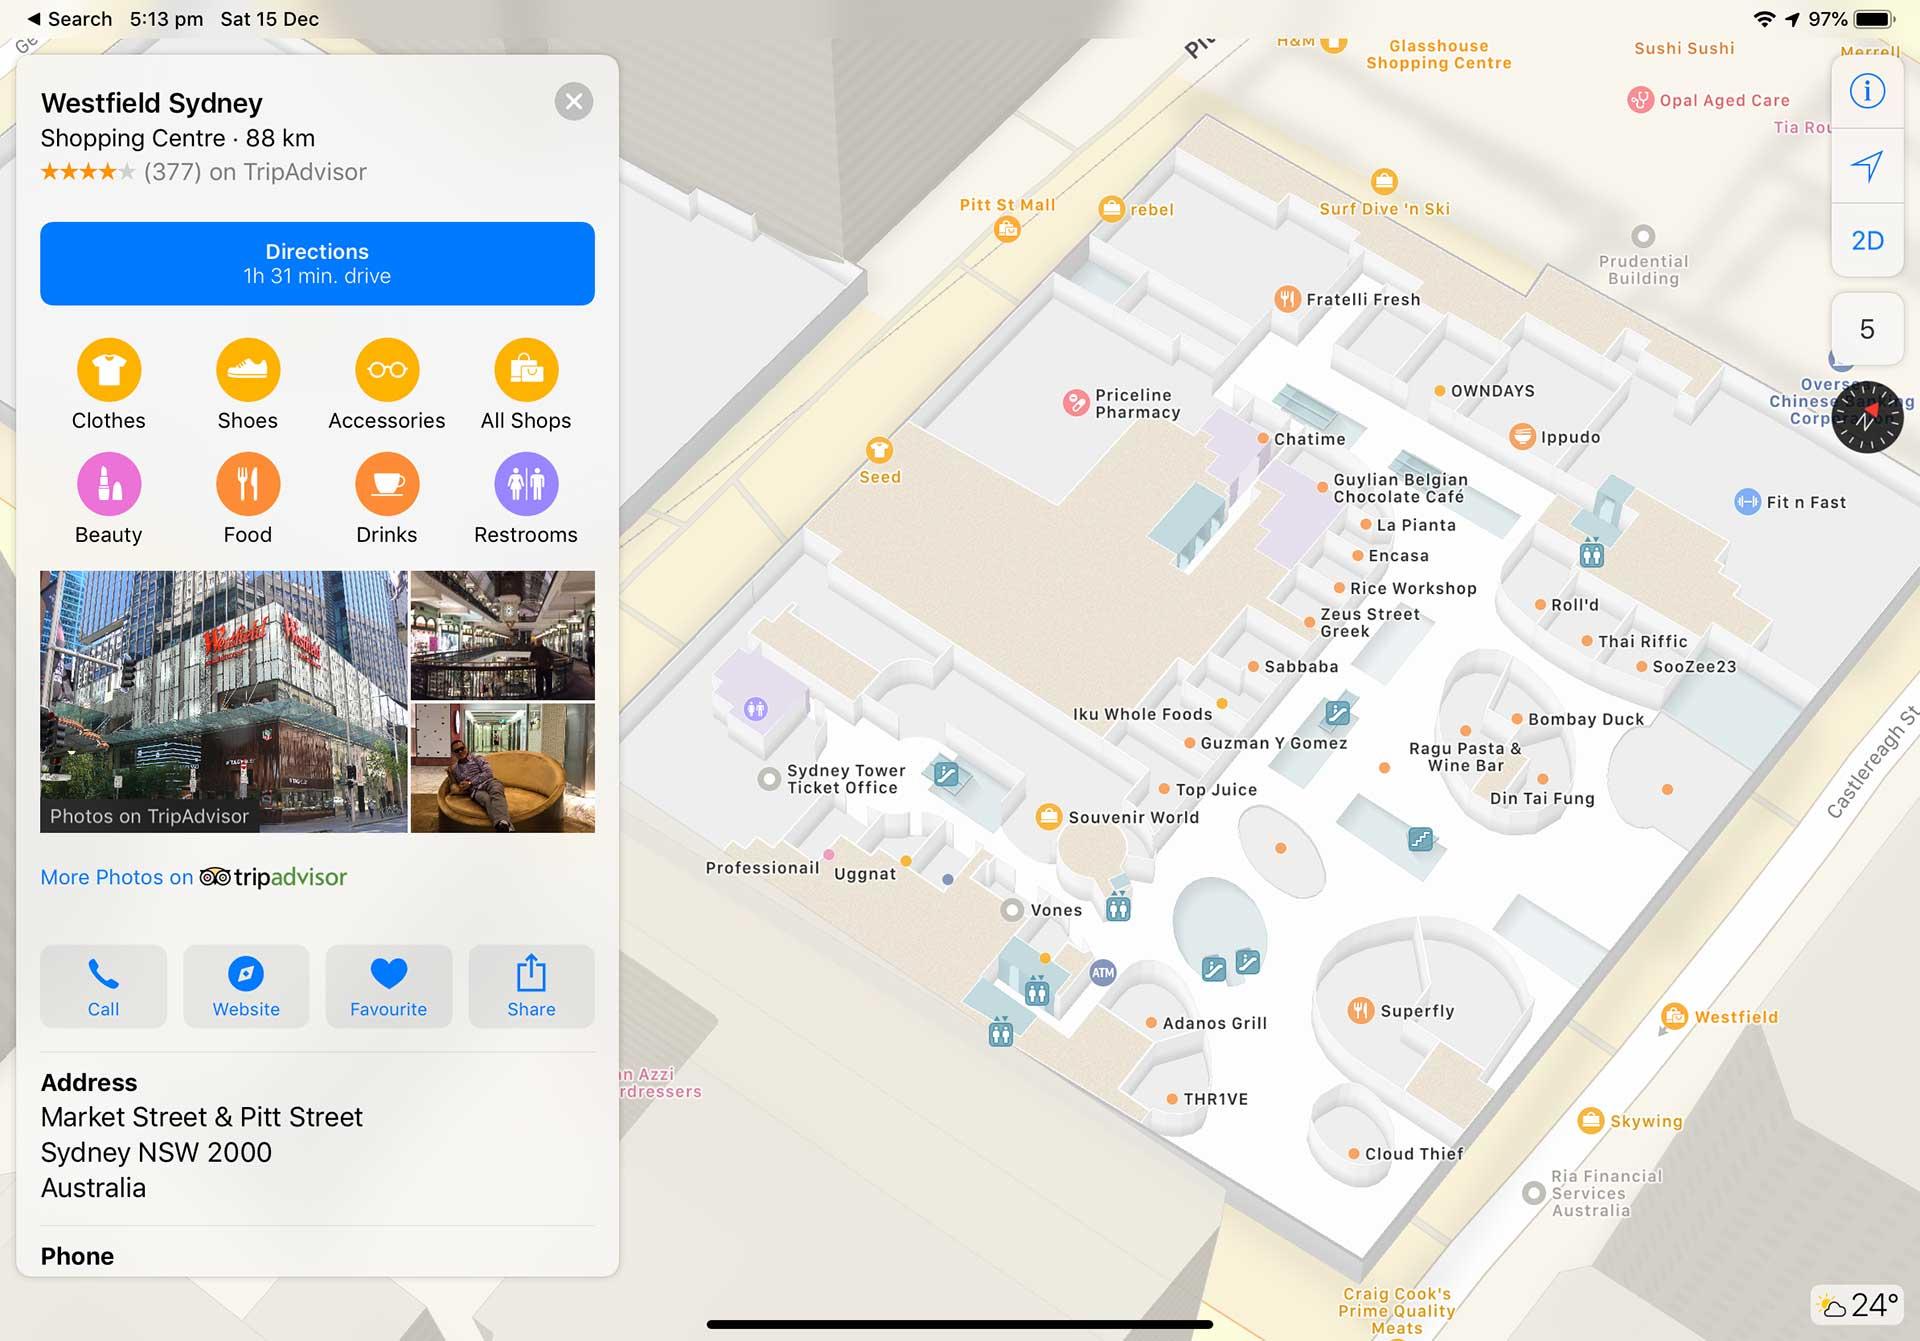 Map Of Australia Sydney.Westfield Centres Gain Indoor Maps On Apple Maps Mac Prices Australia